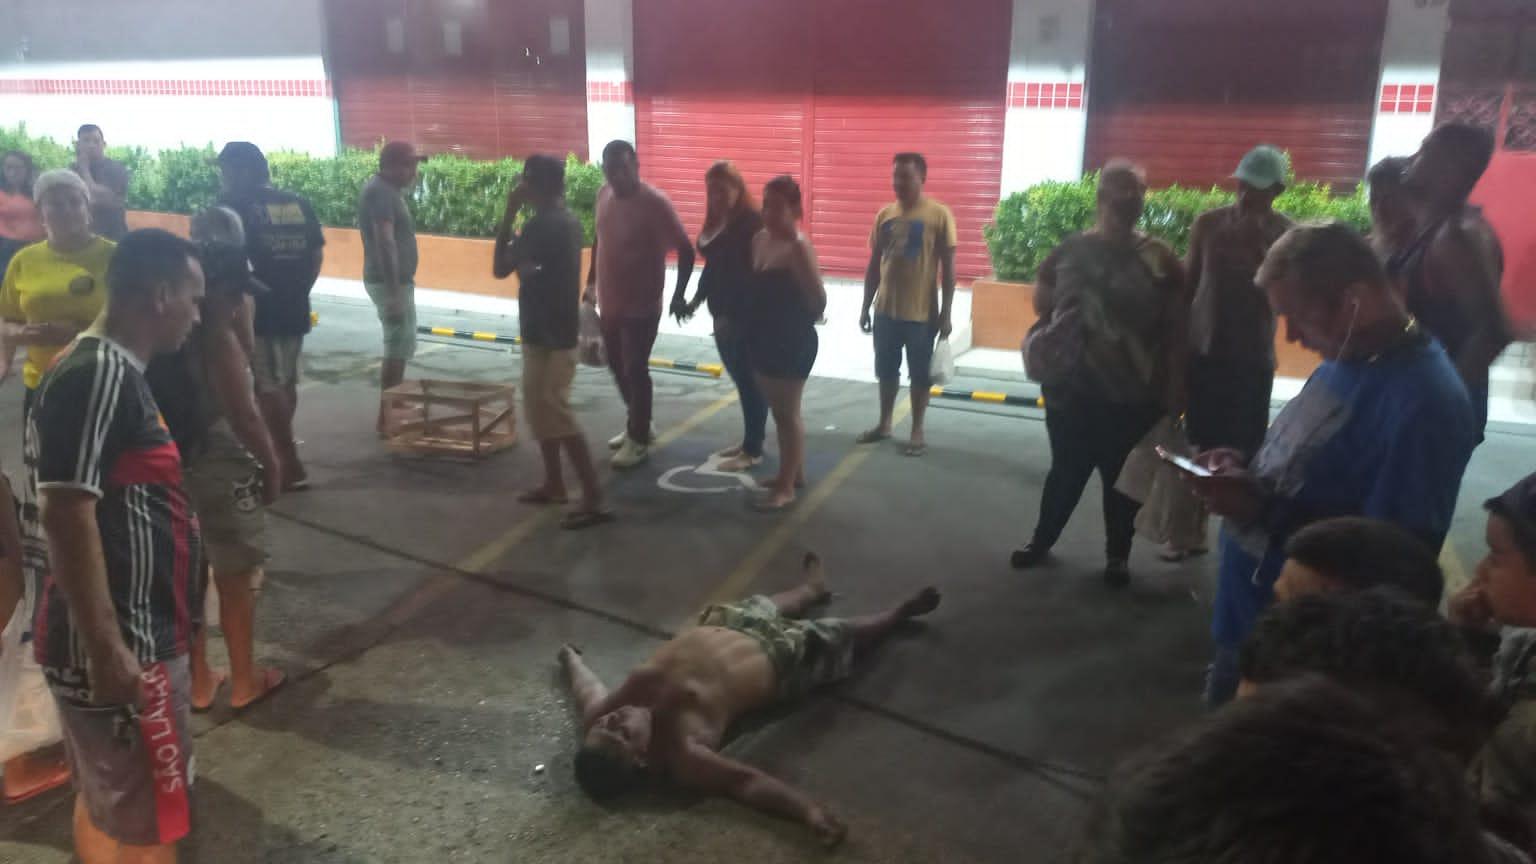 Vítima reage a assalto e suspeito morre durante mal súbito